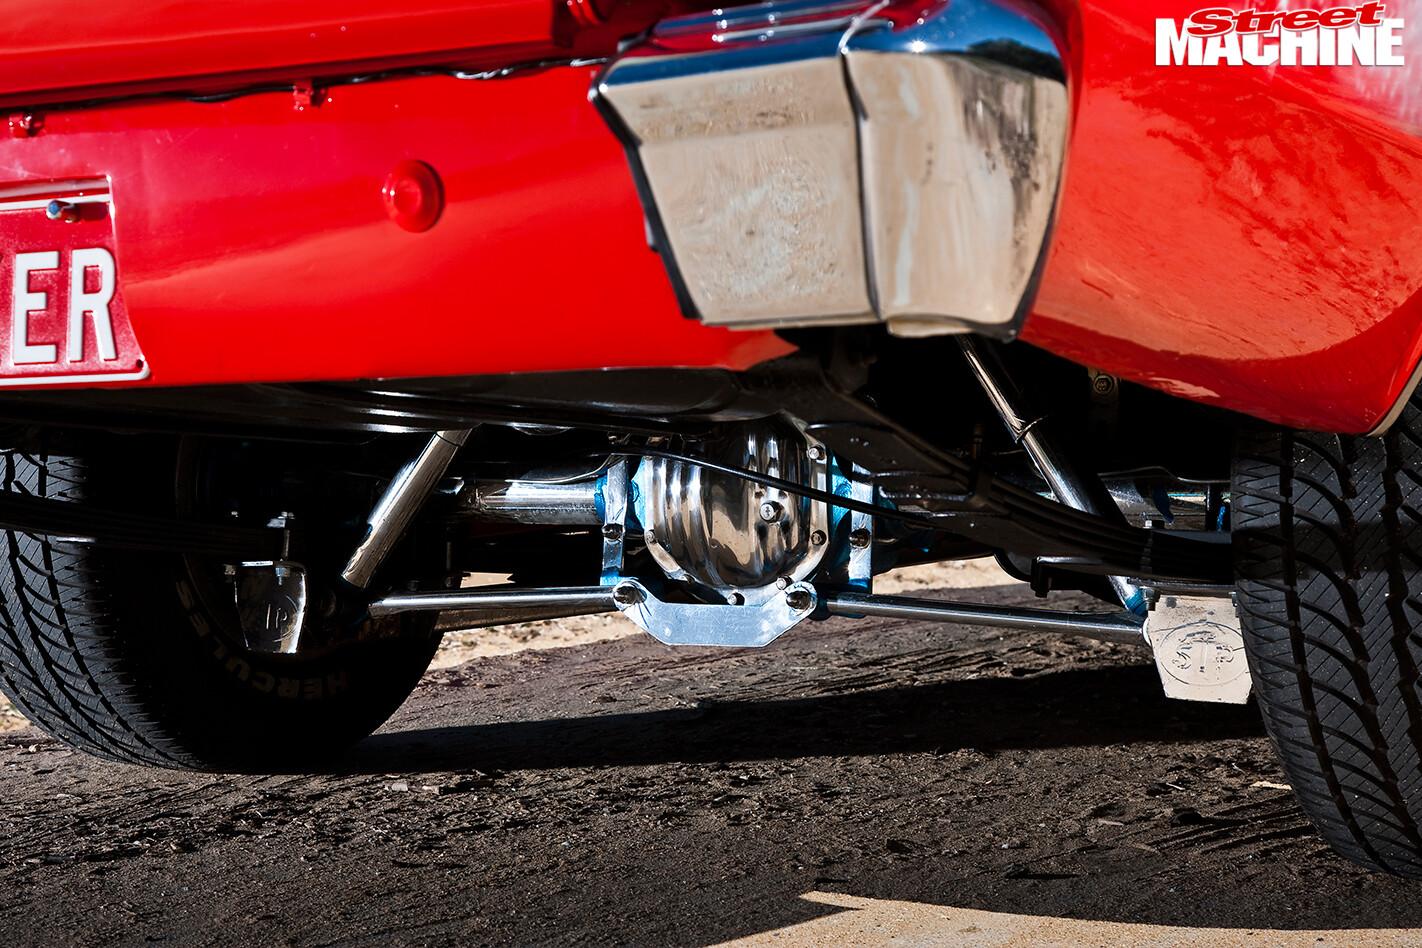 Chrysler -panel -van -under